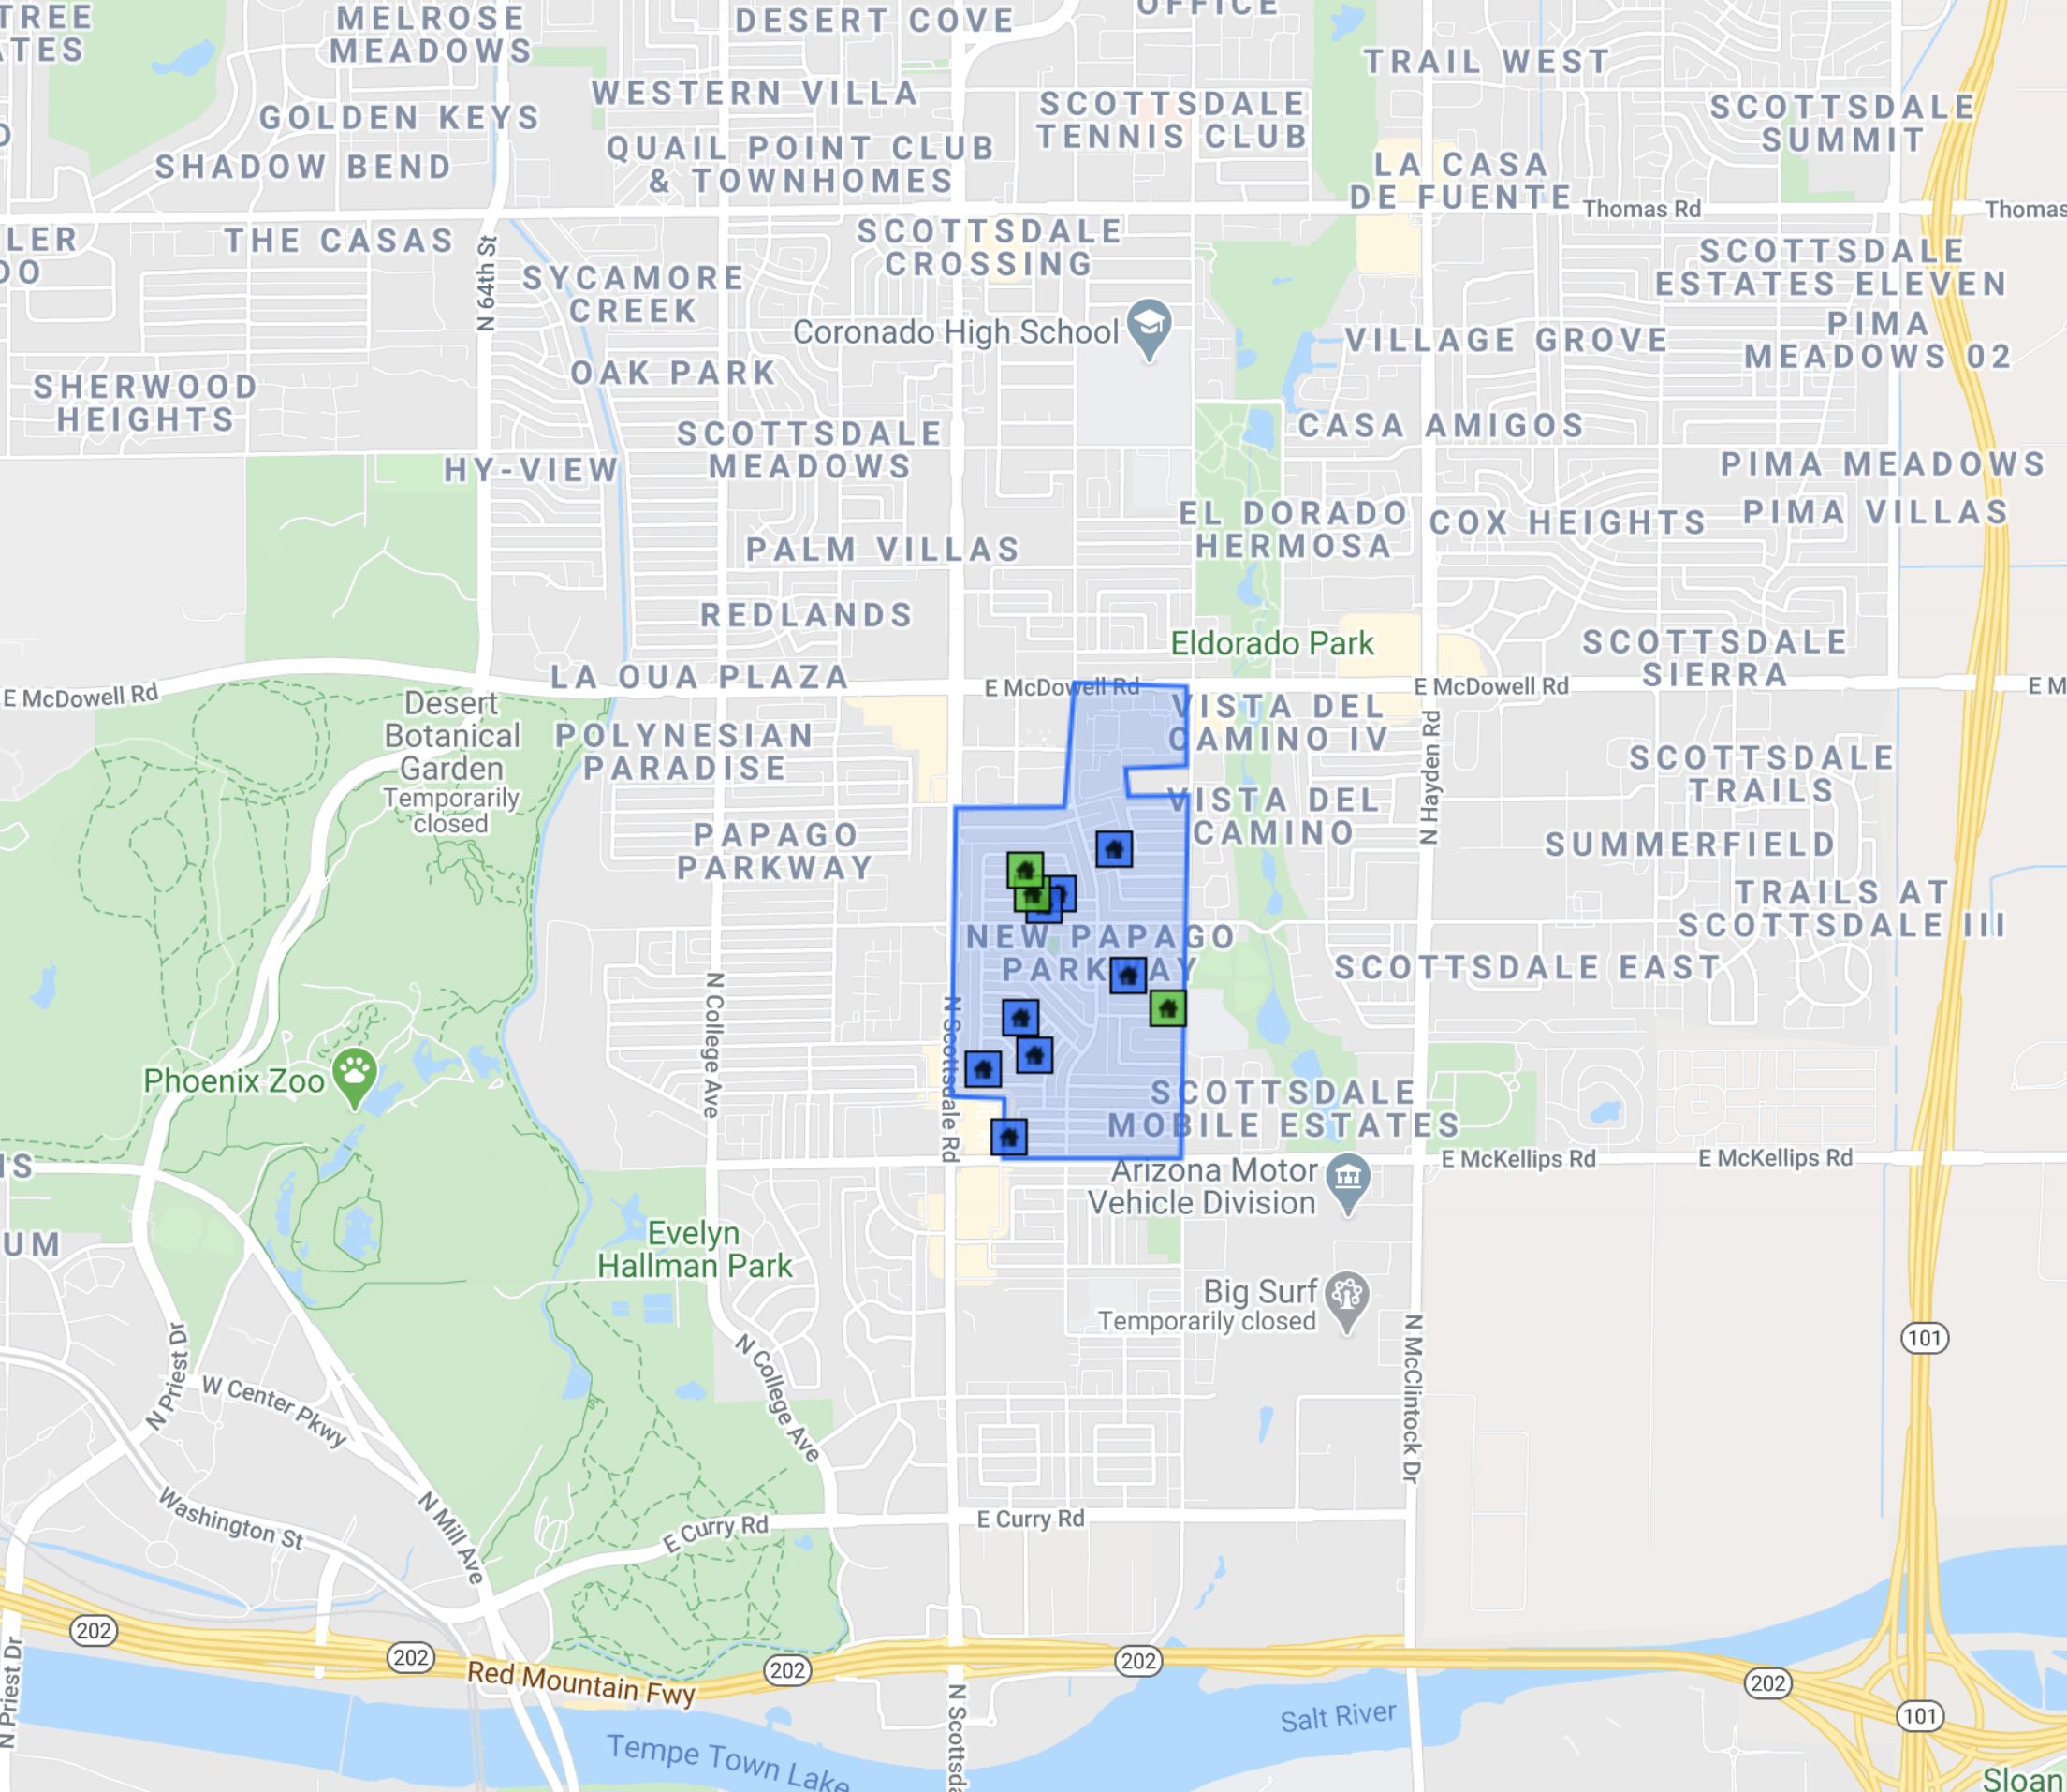 7325 E Papago Dr Scottsdale, AZ 85257 comps map